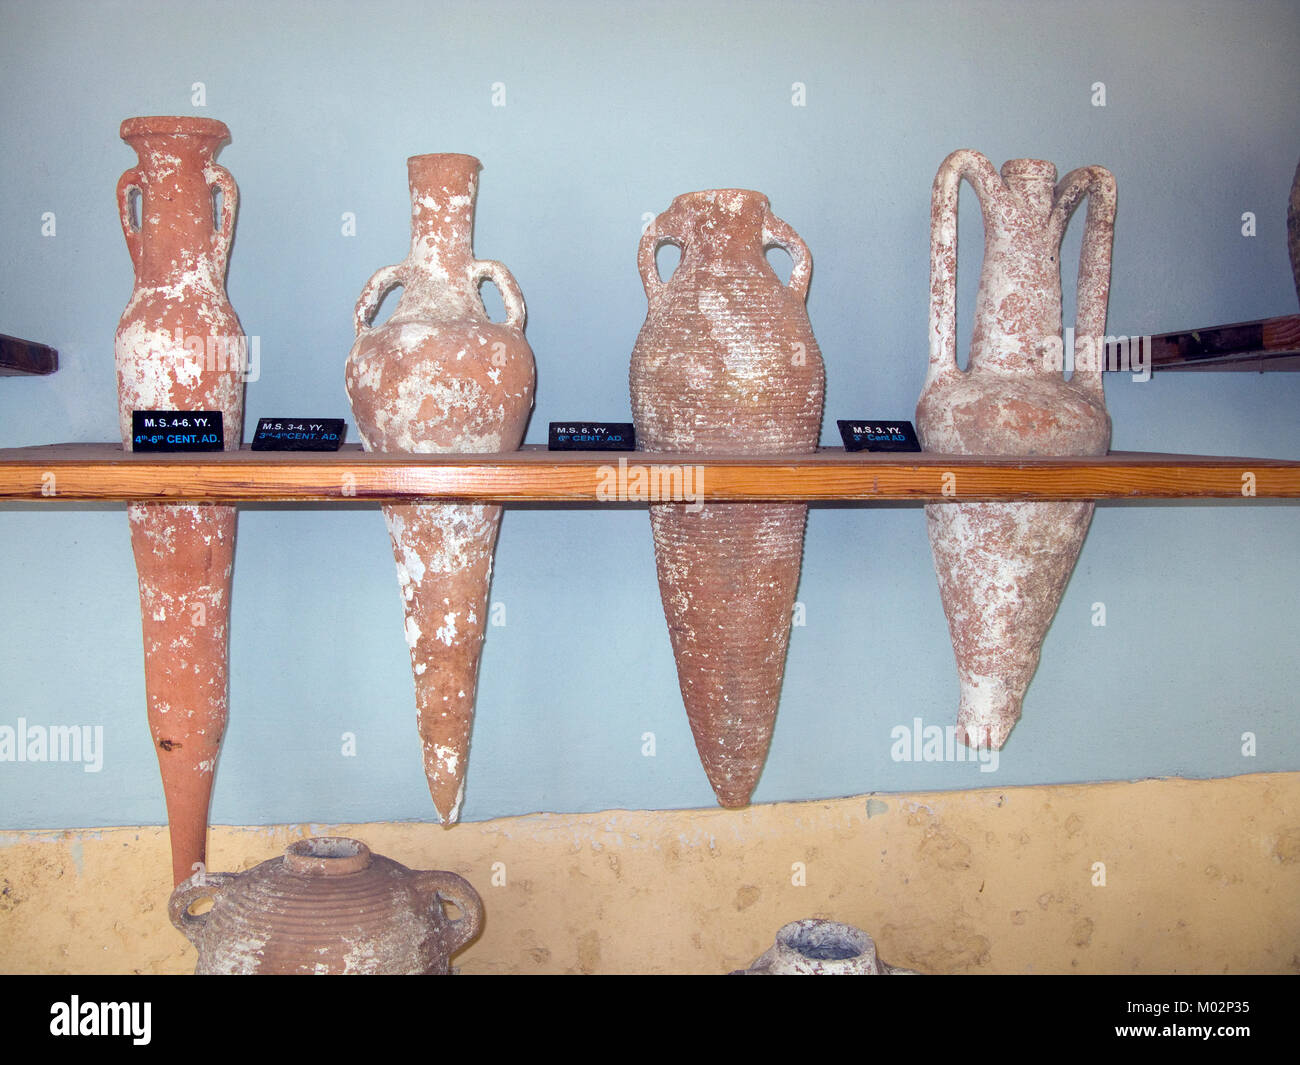 Amphoras, underwater findings at Aegean coast, underwater archaeology museum at Bodrum, Turkey, Mediteranean sea, - Stock Image